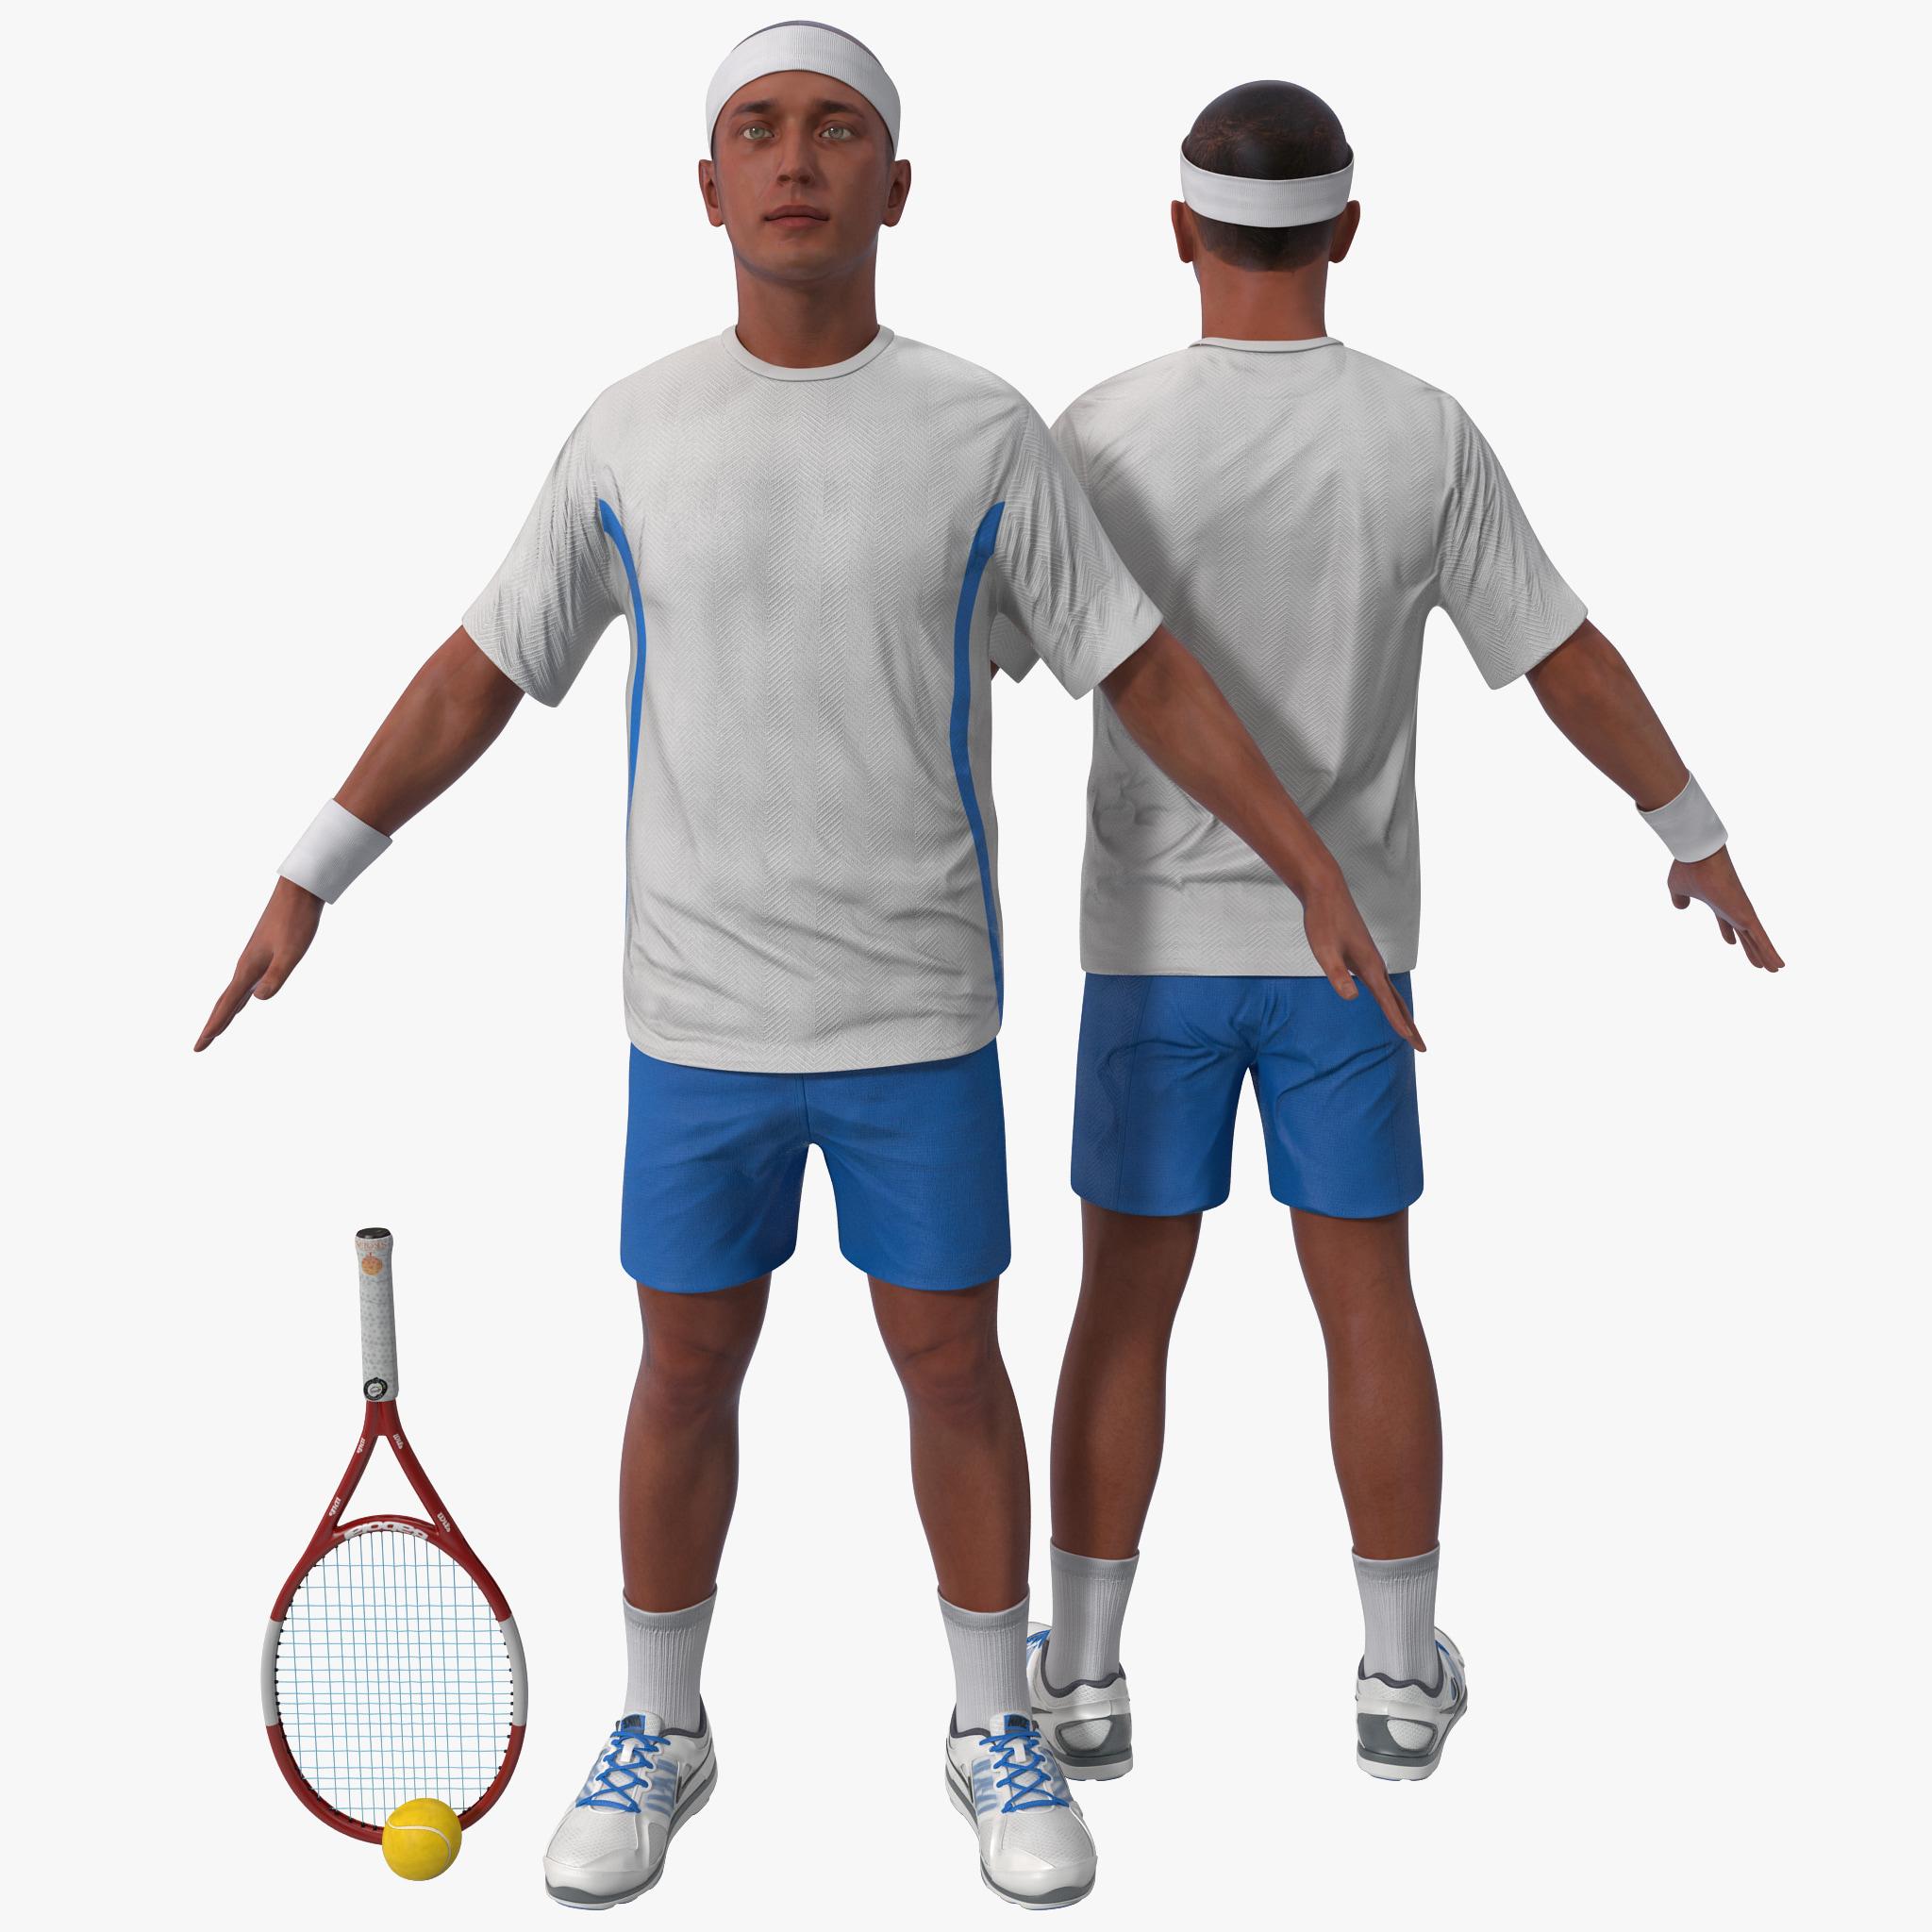 Tennis Player Rigged 2_1.jpg